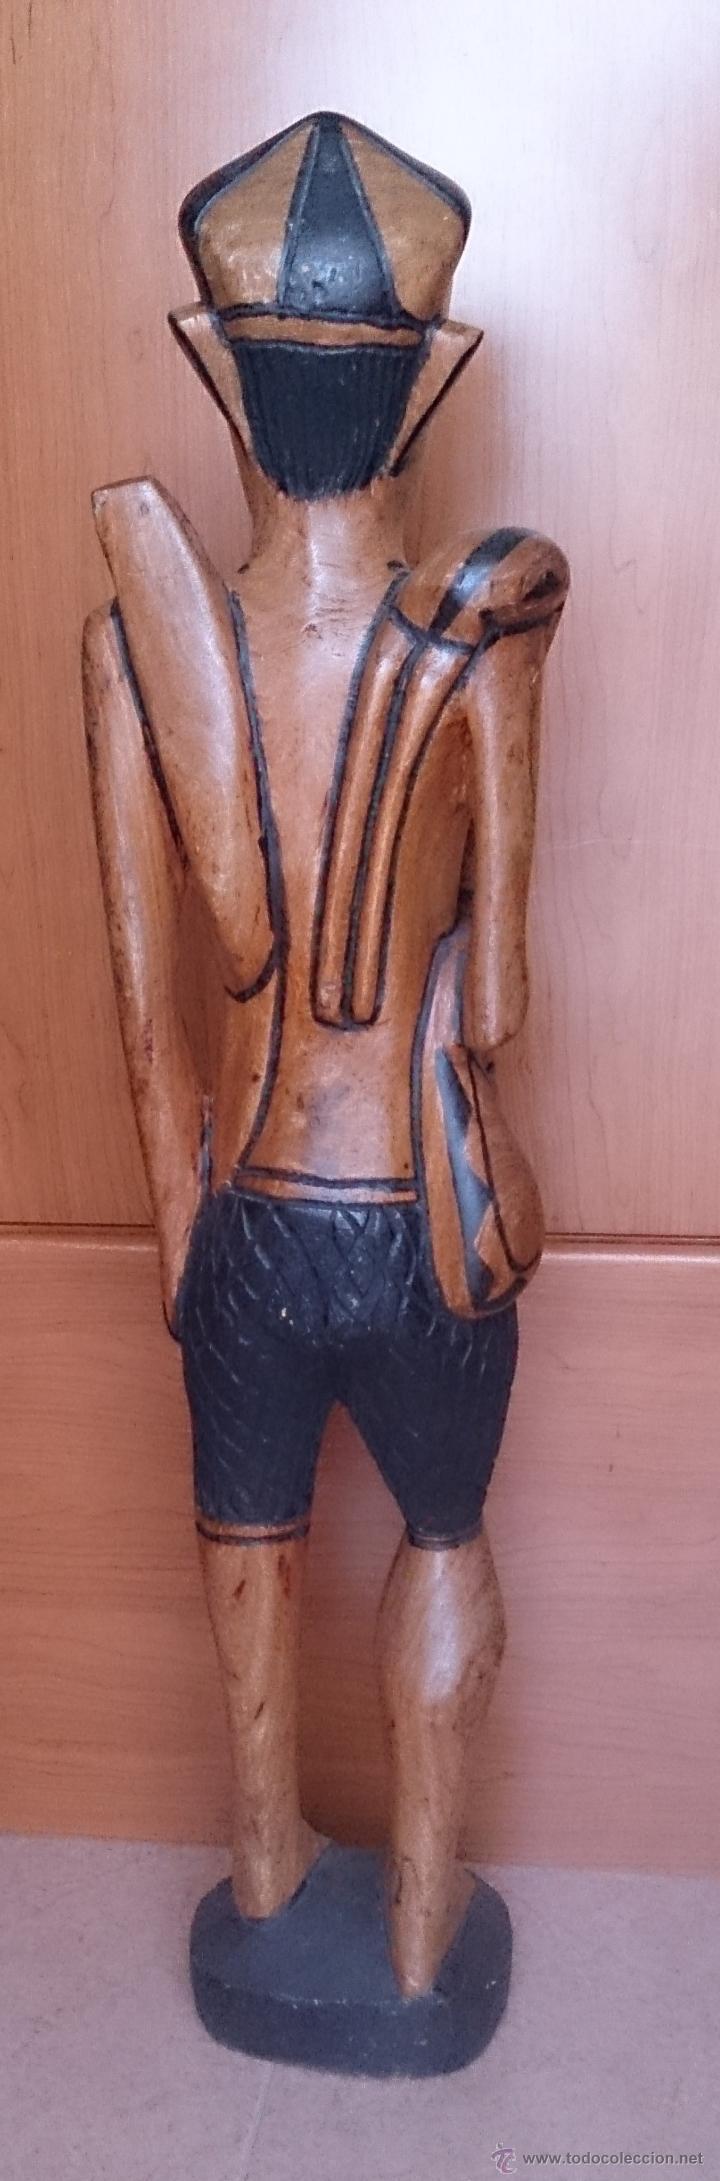 Arte: Gran talla indígena en madera maciza ( 91,5 CM DE ALTO ) . - Foto 5 - 43242684